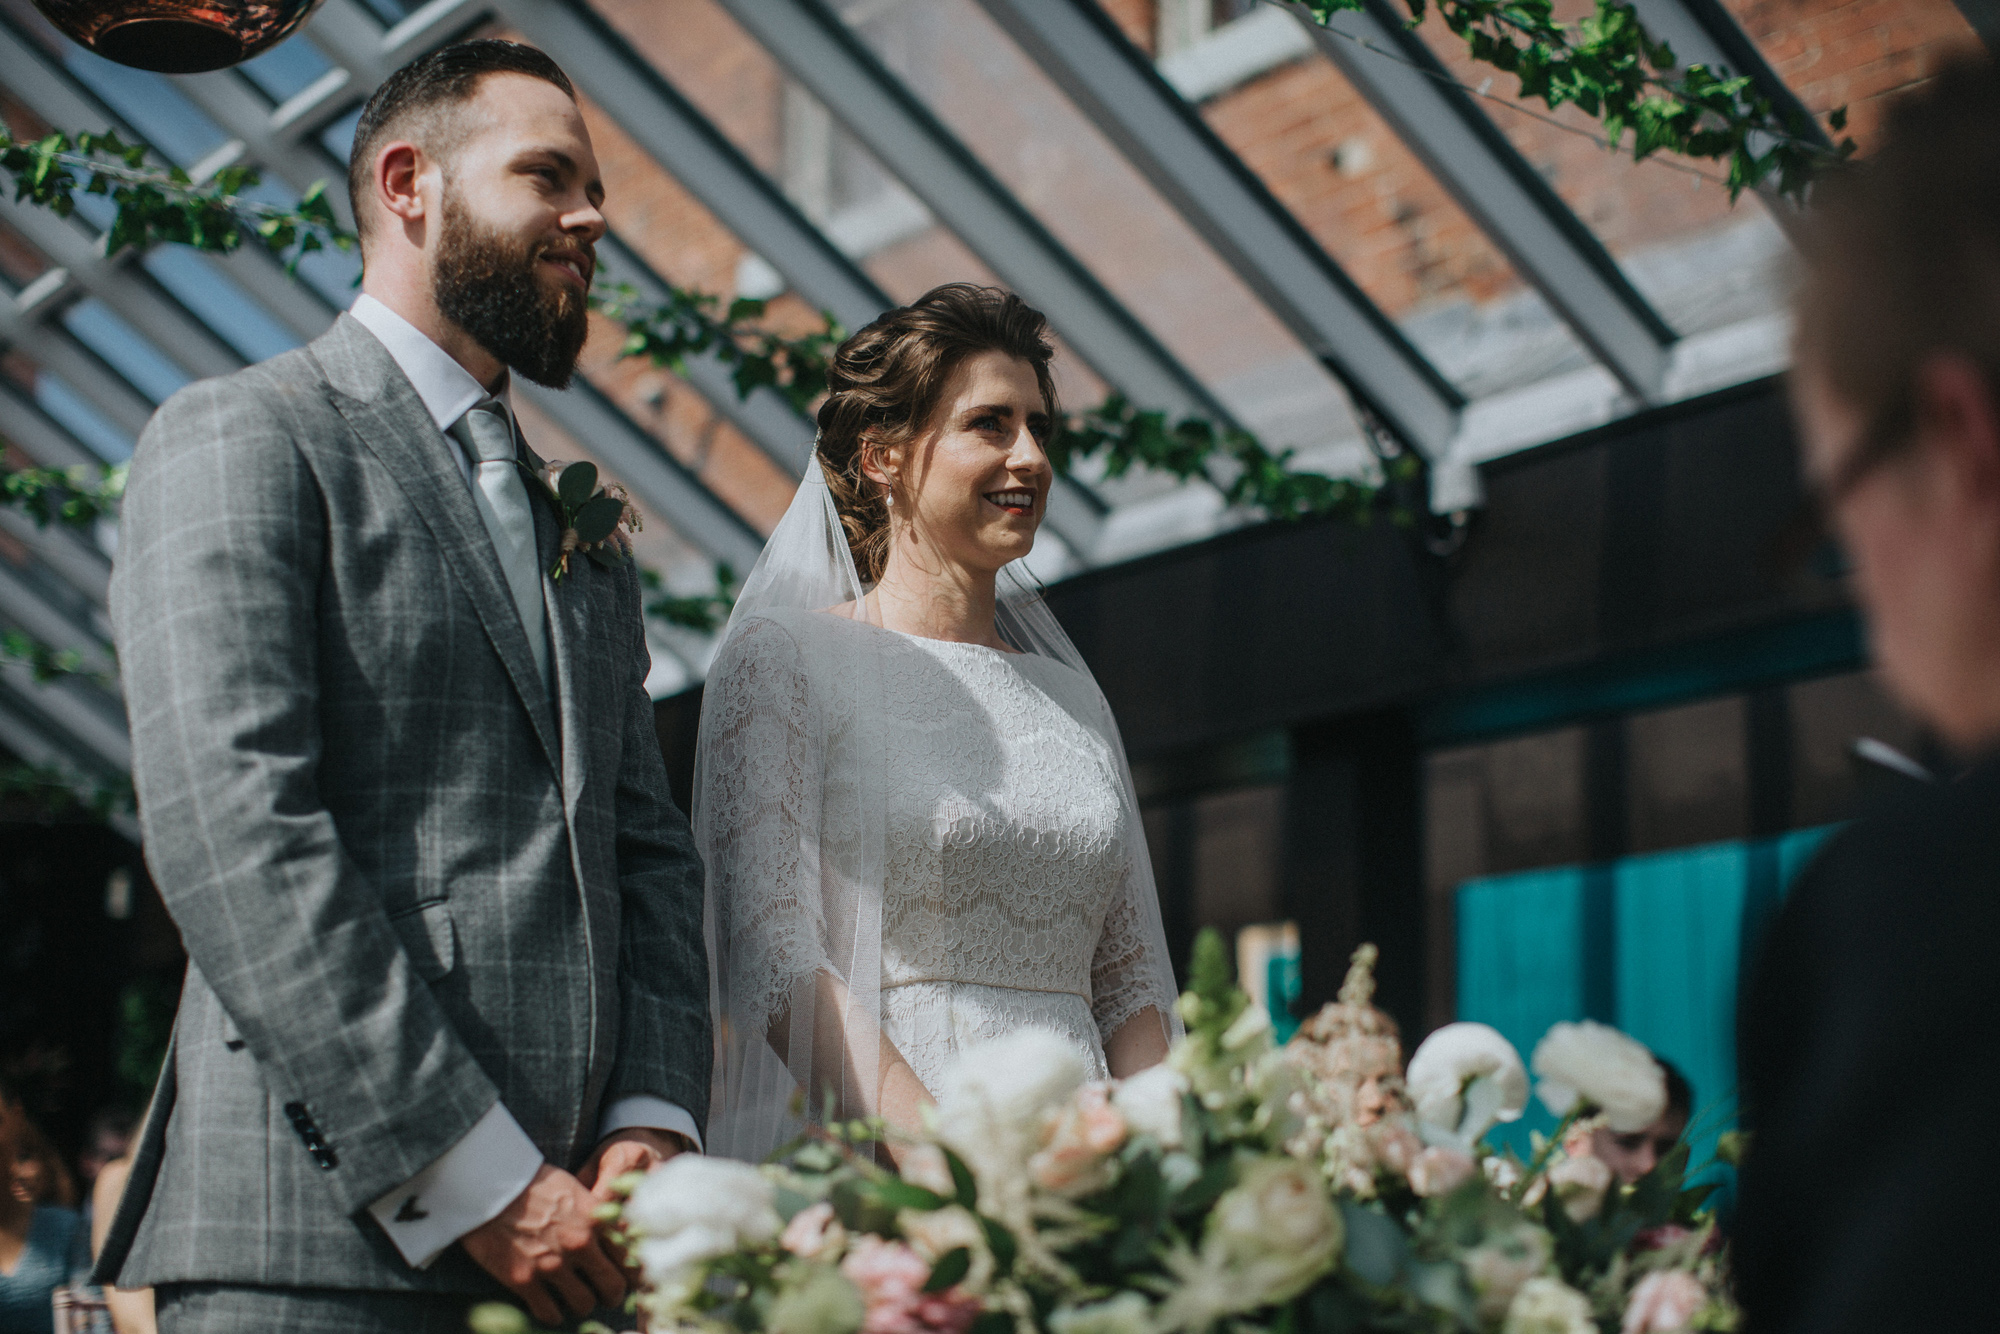 Kate-Beaumont-Lace-Flared-Dahlia-Gown-Leeds-Wedding-Bloom-Weddings-24.jpg